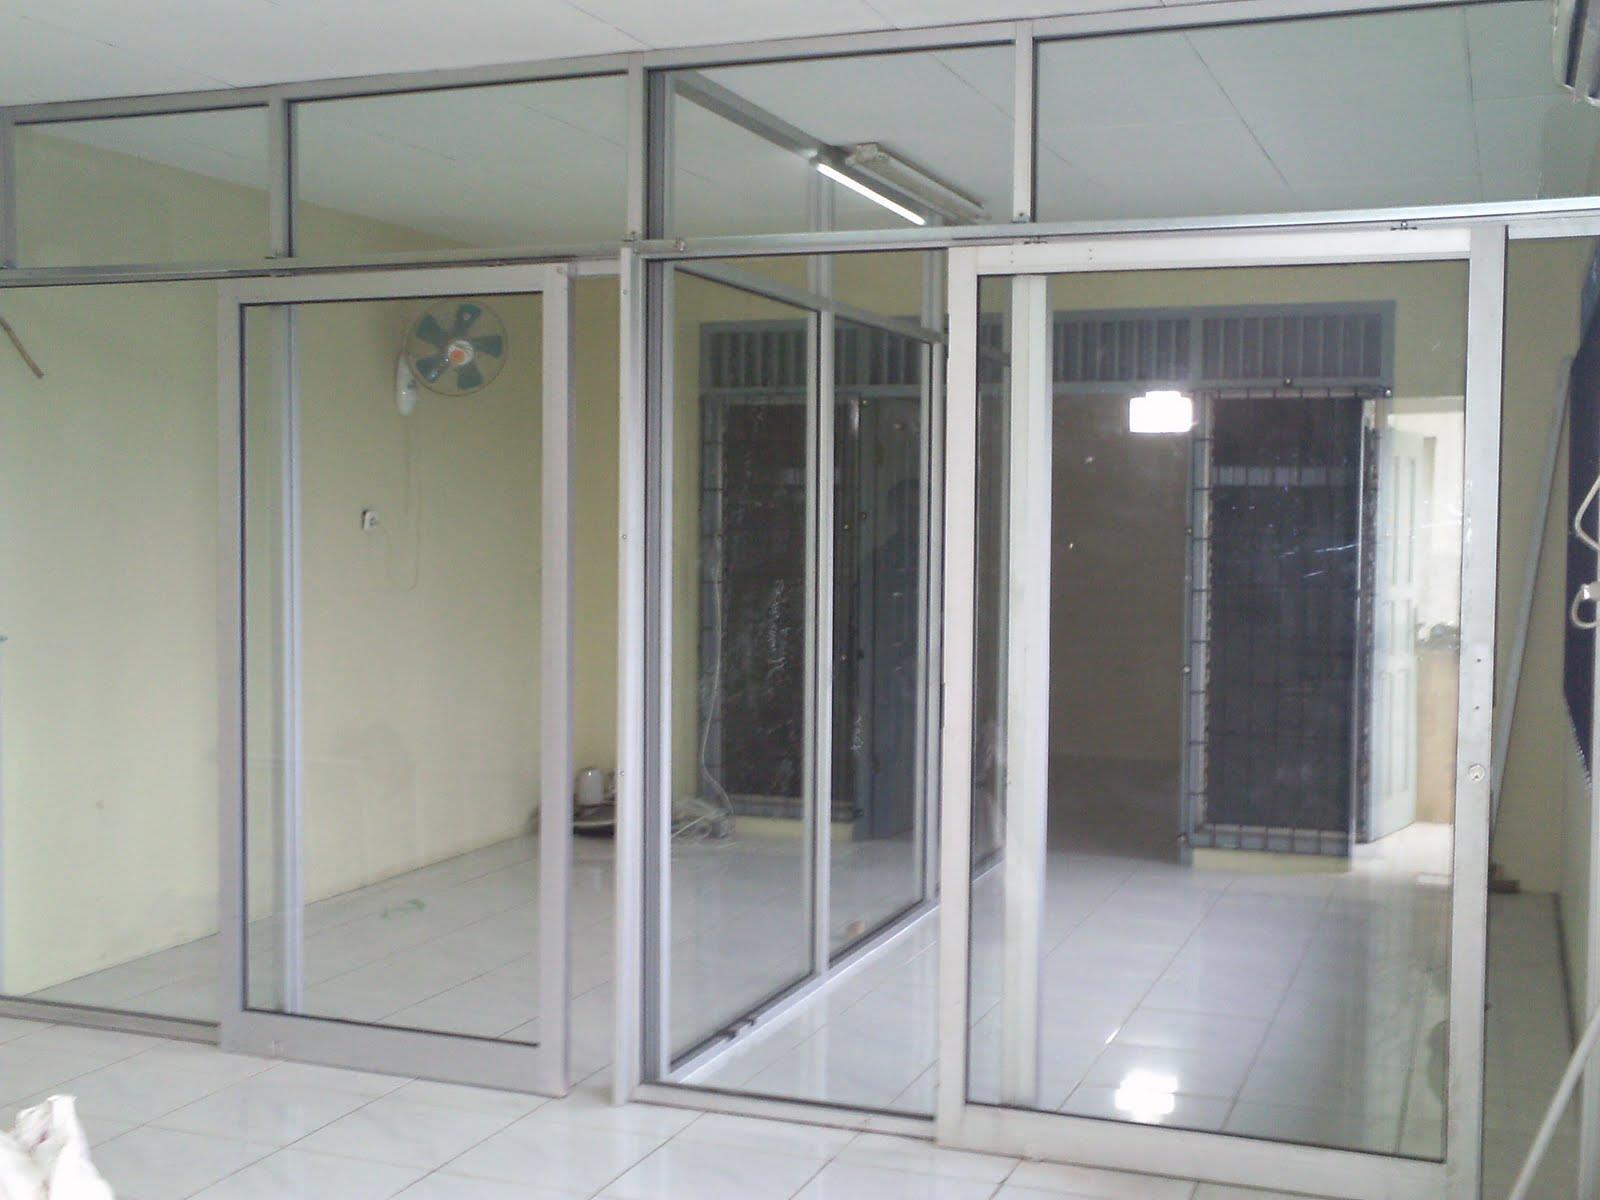 Jual Partisi Kantor Aluminium Kaca Harga Murah Jakarta